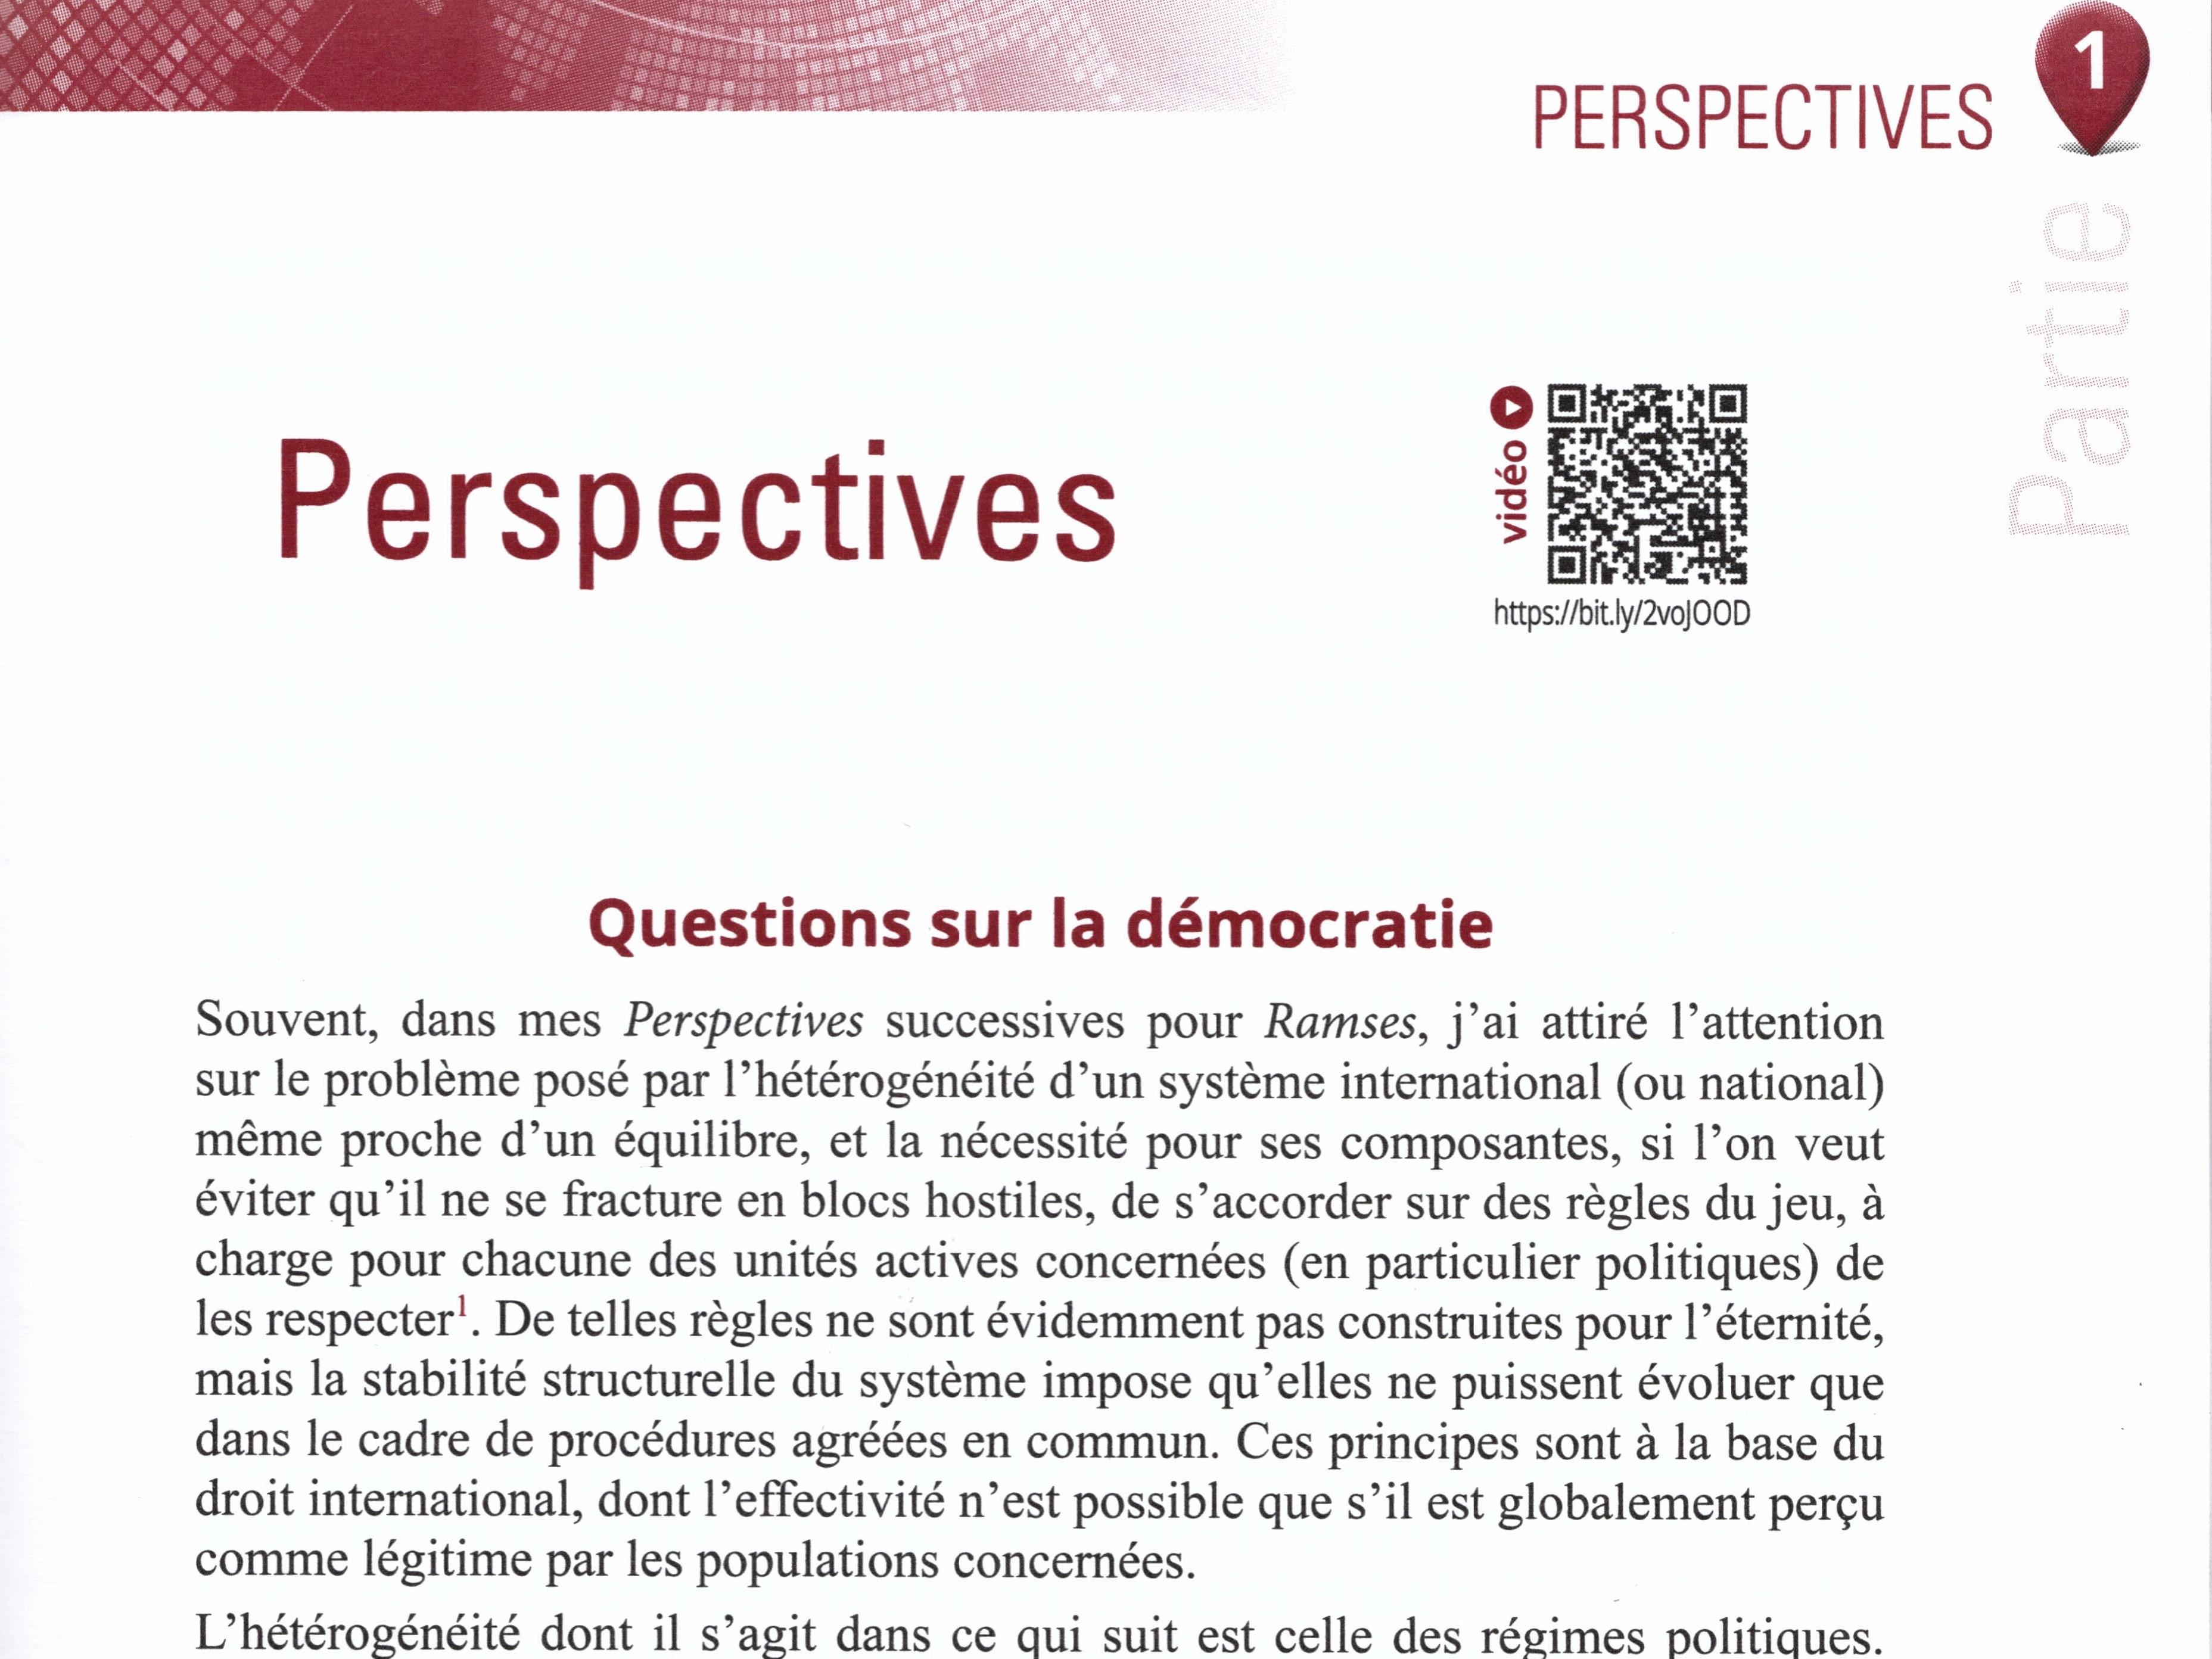 Ramses Perspectives 2019 de Thierry de Montbrial